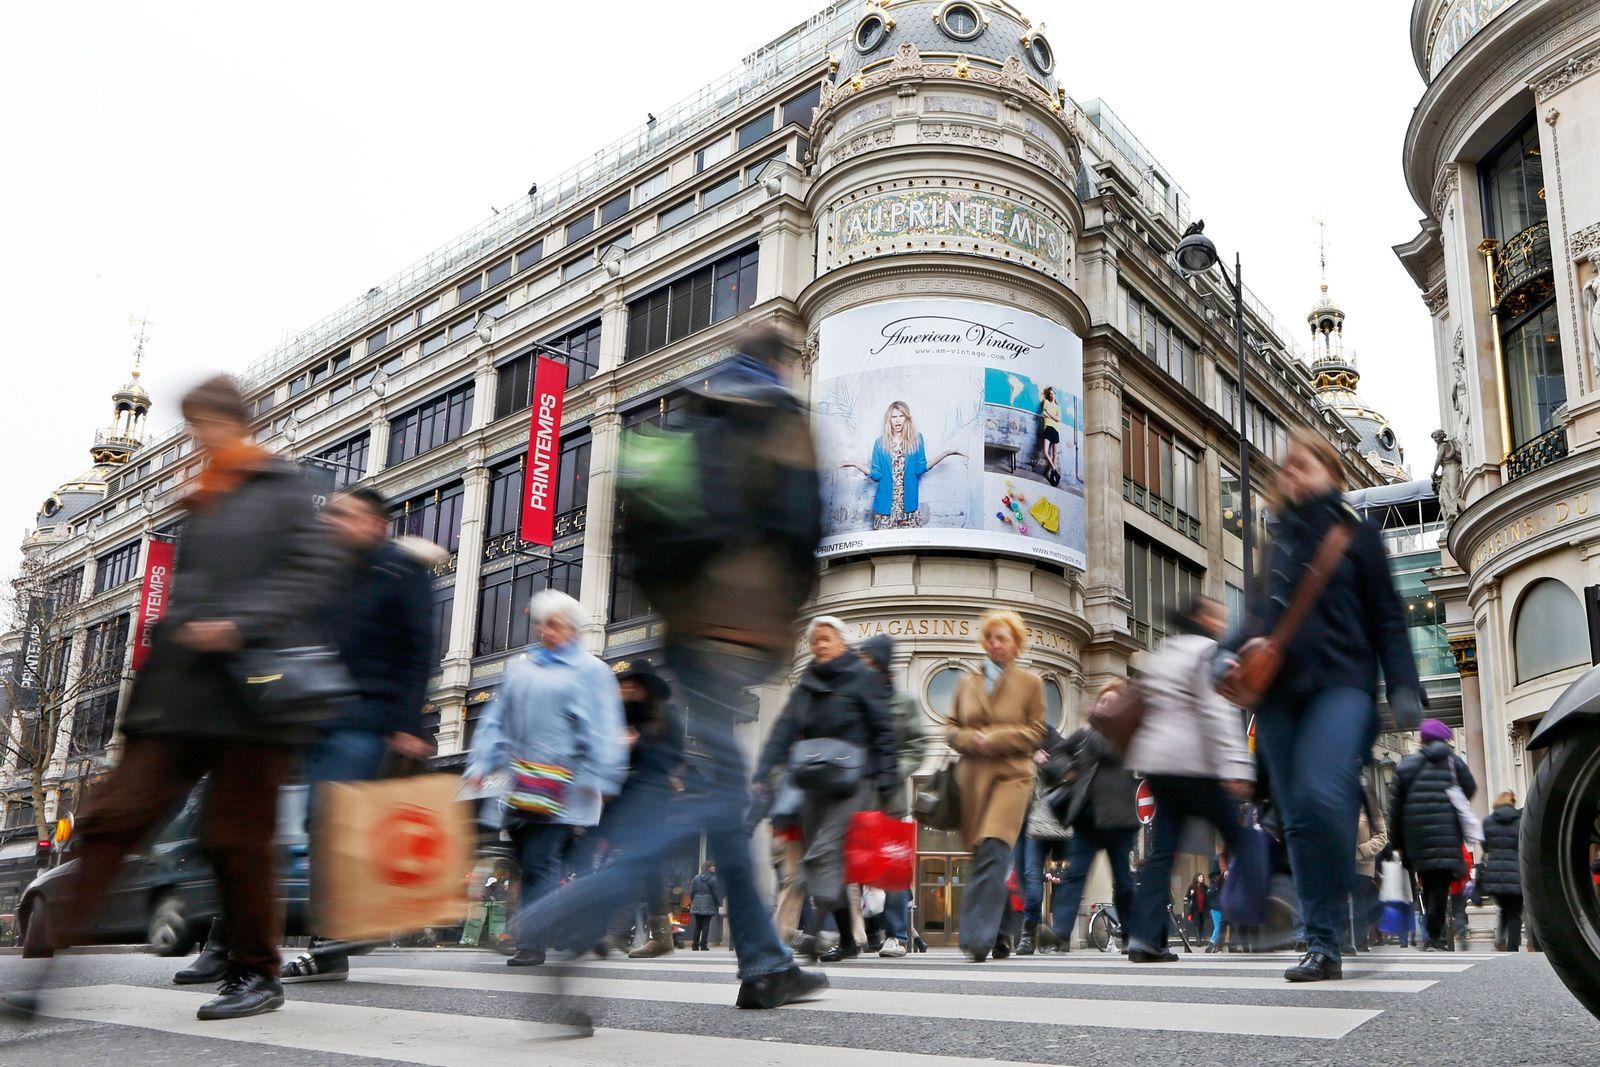 Frankreich / Konjunktur / Shoppen / Passanten / Konsum / Inflation